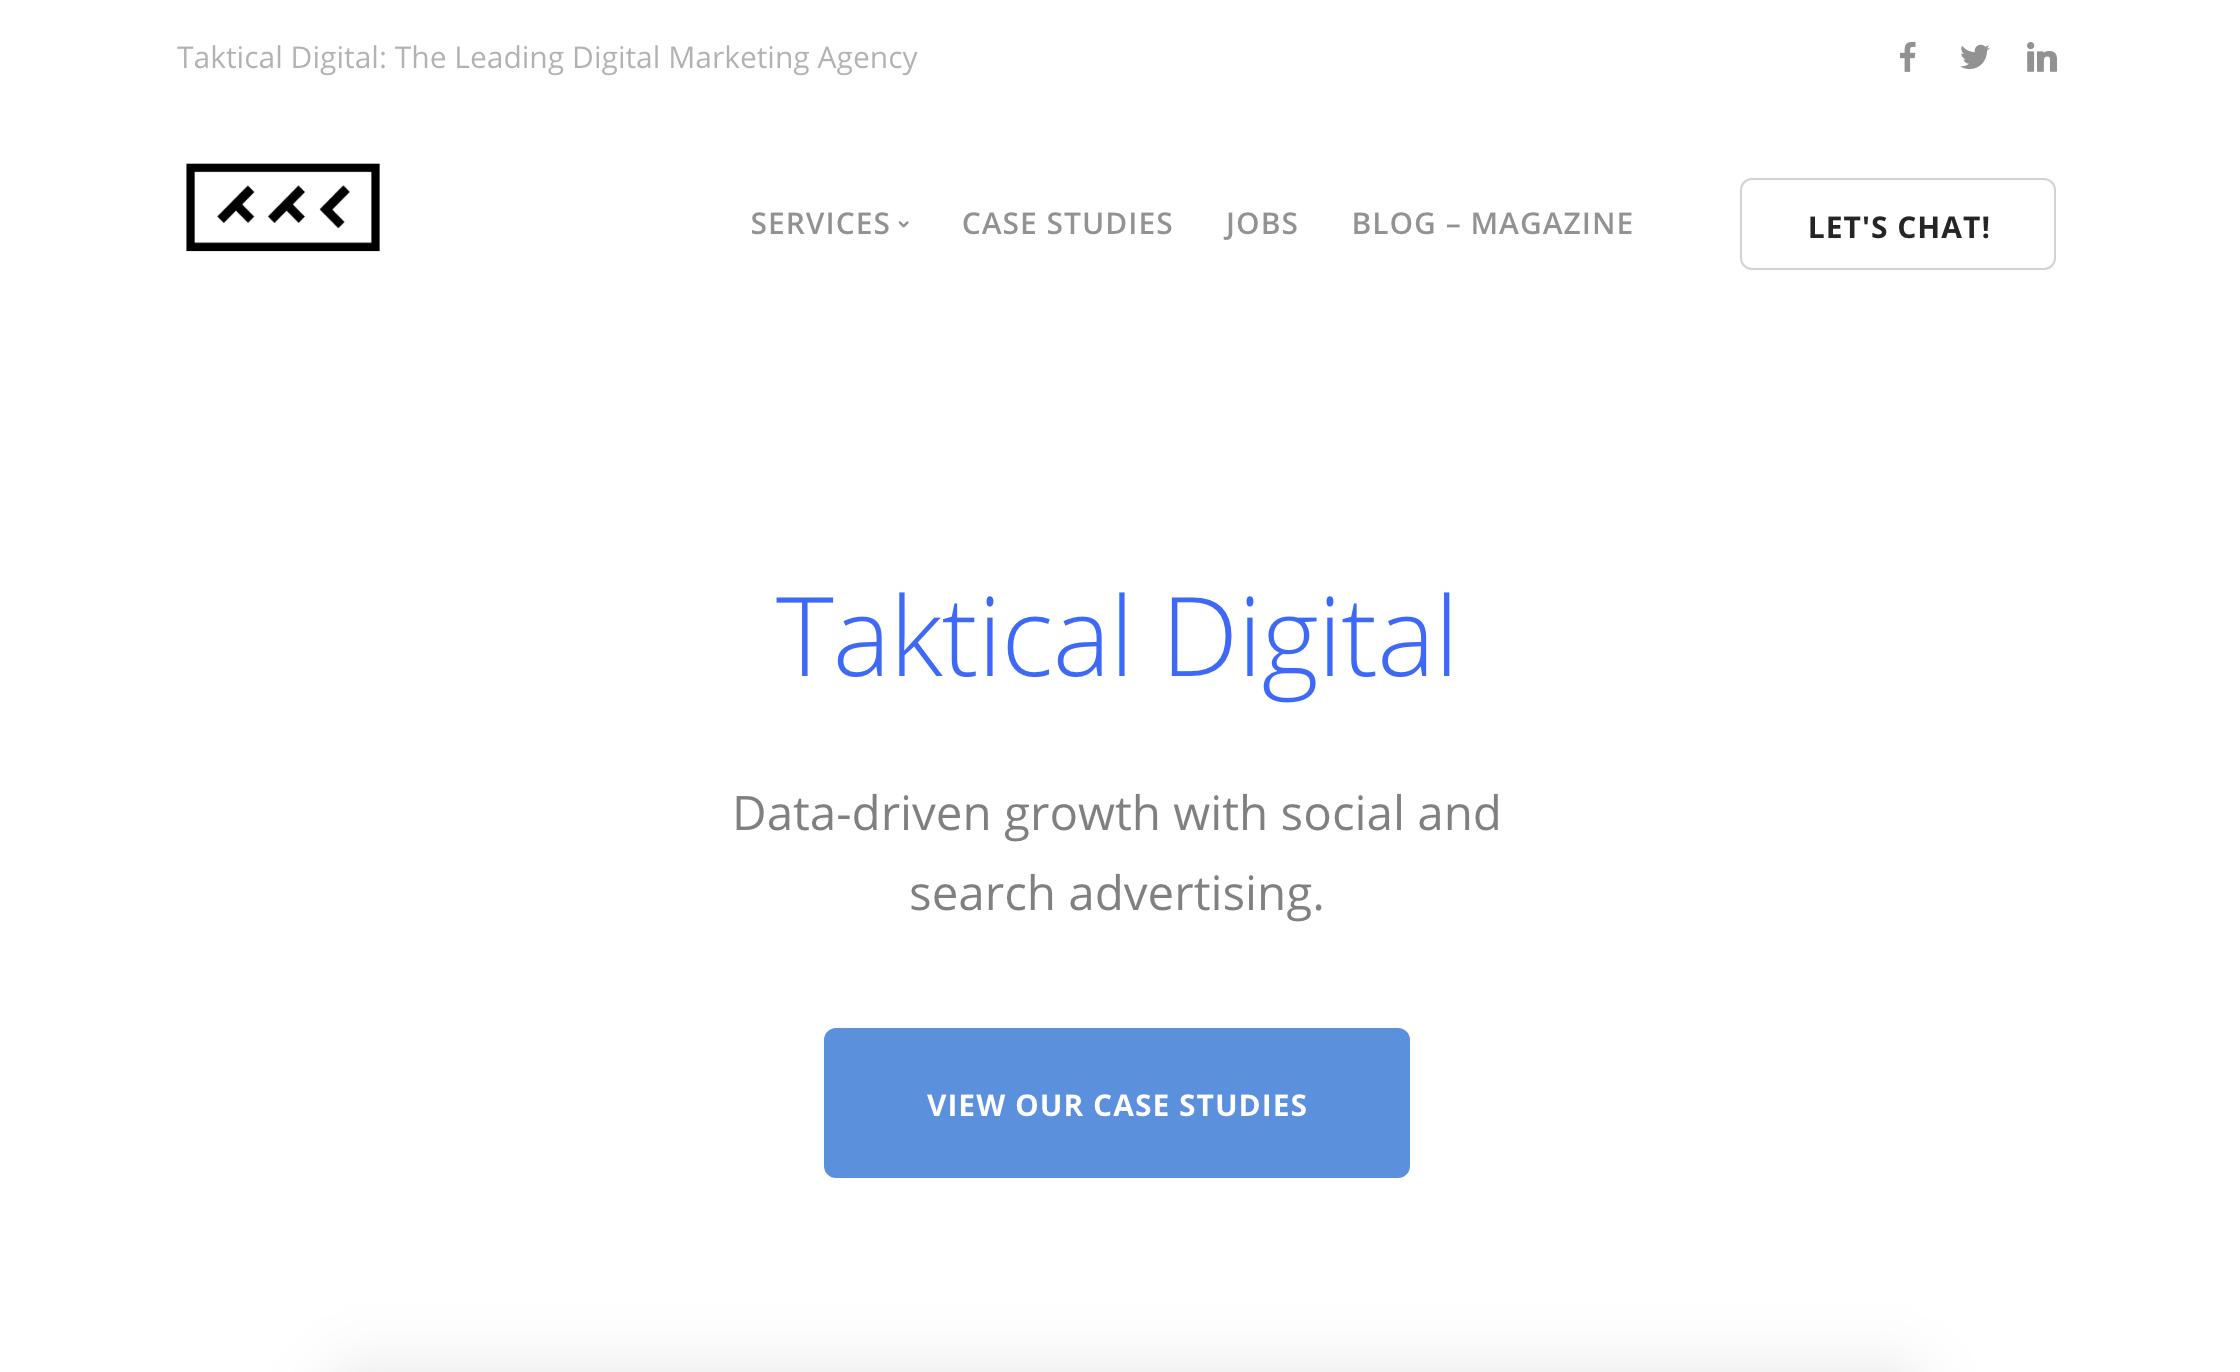 Taktical Digital